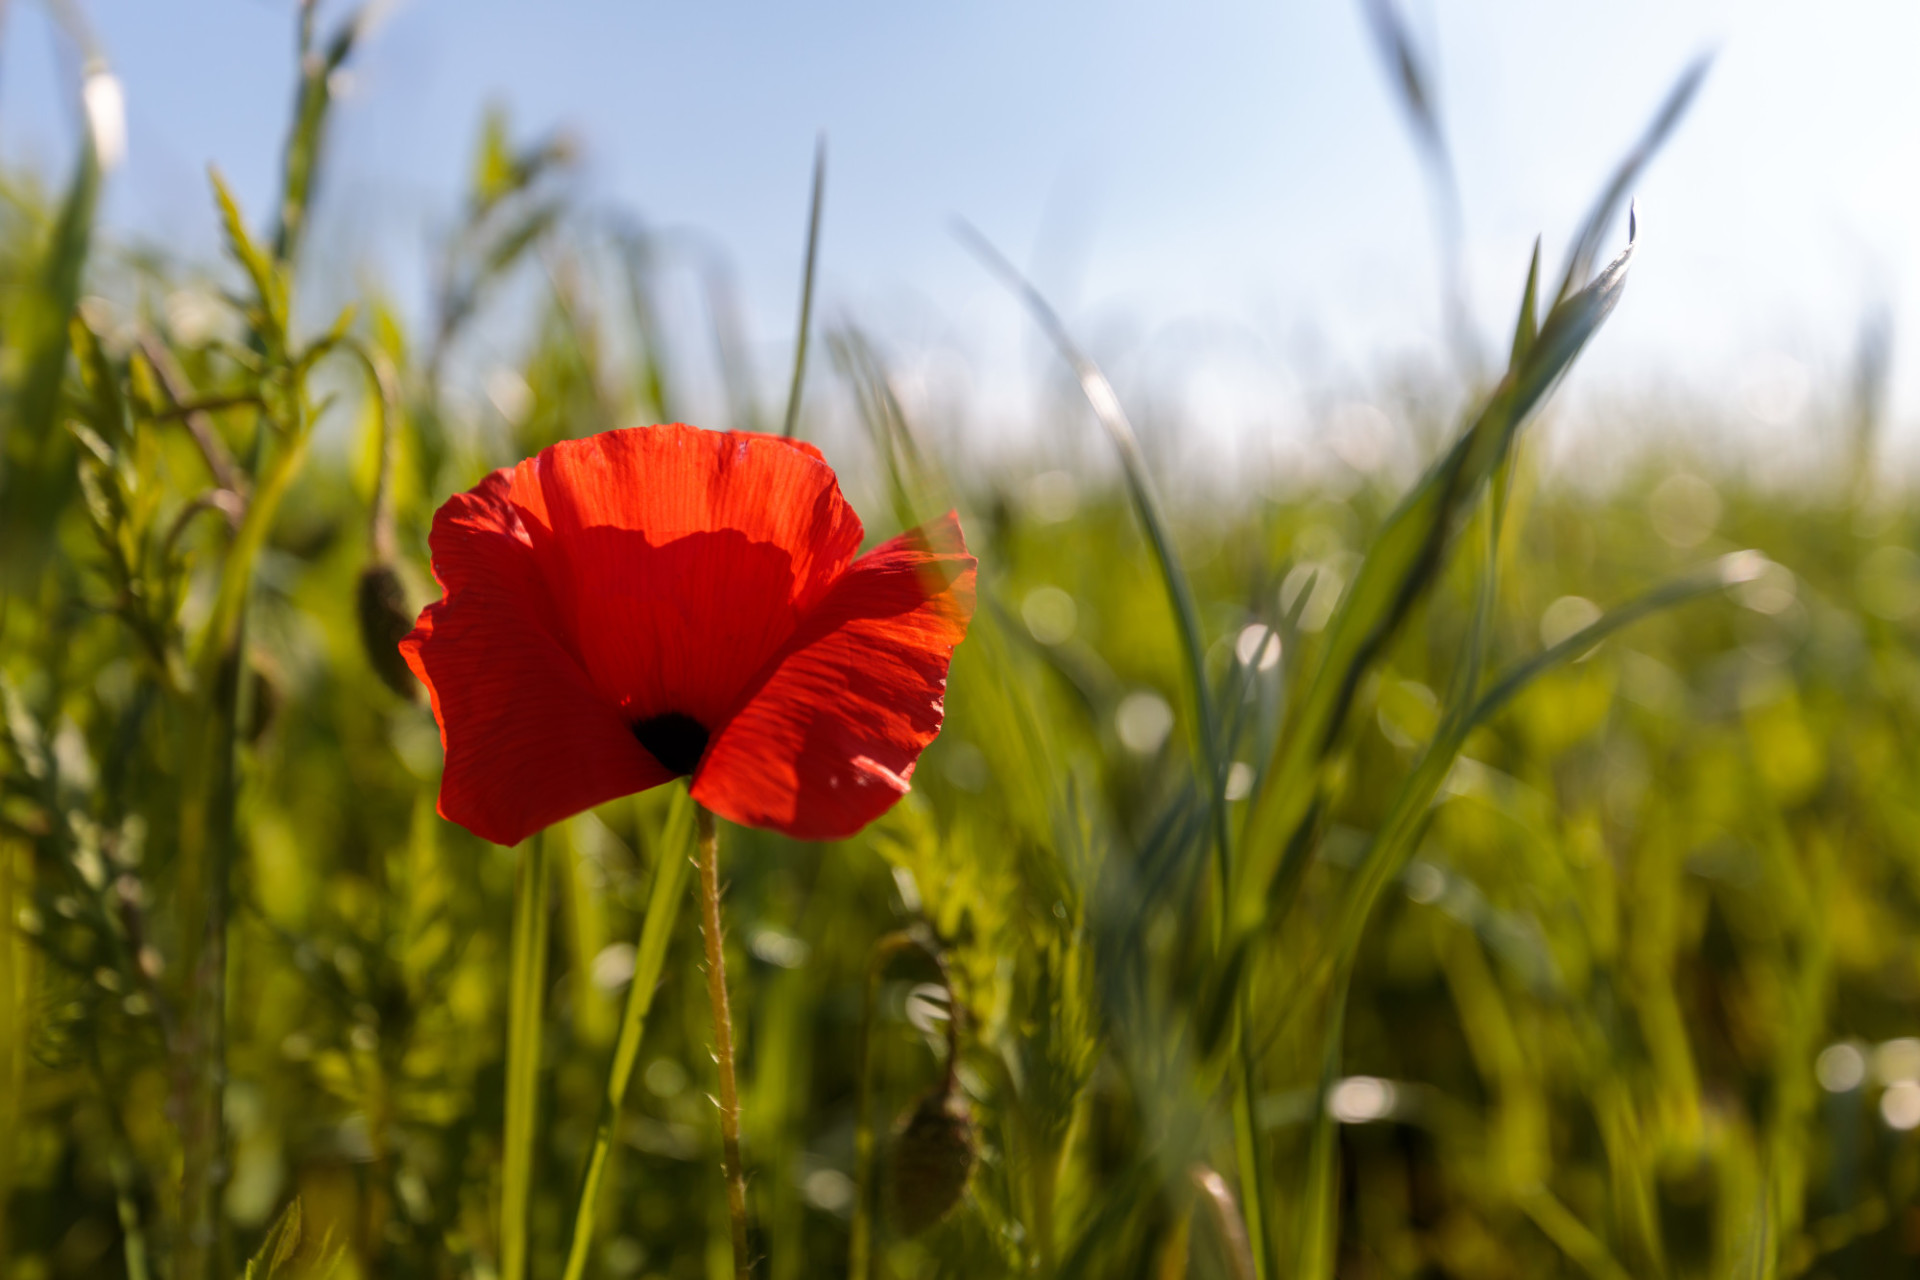 Red poppy in the field